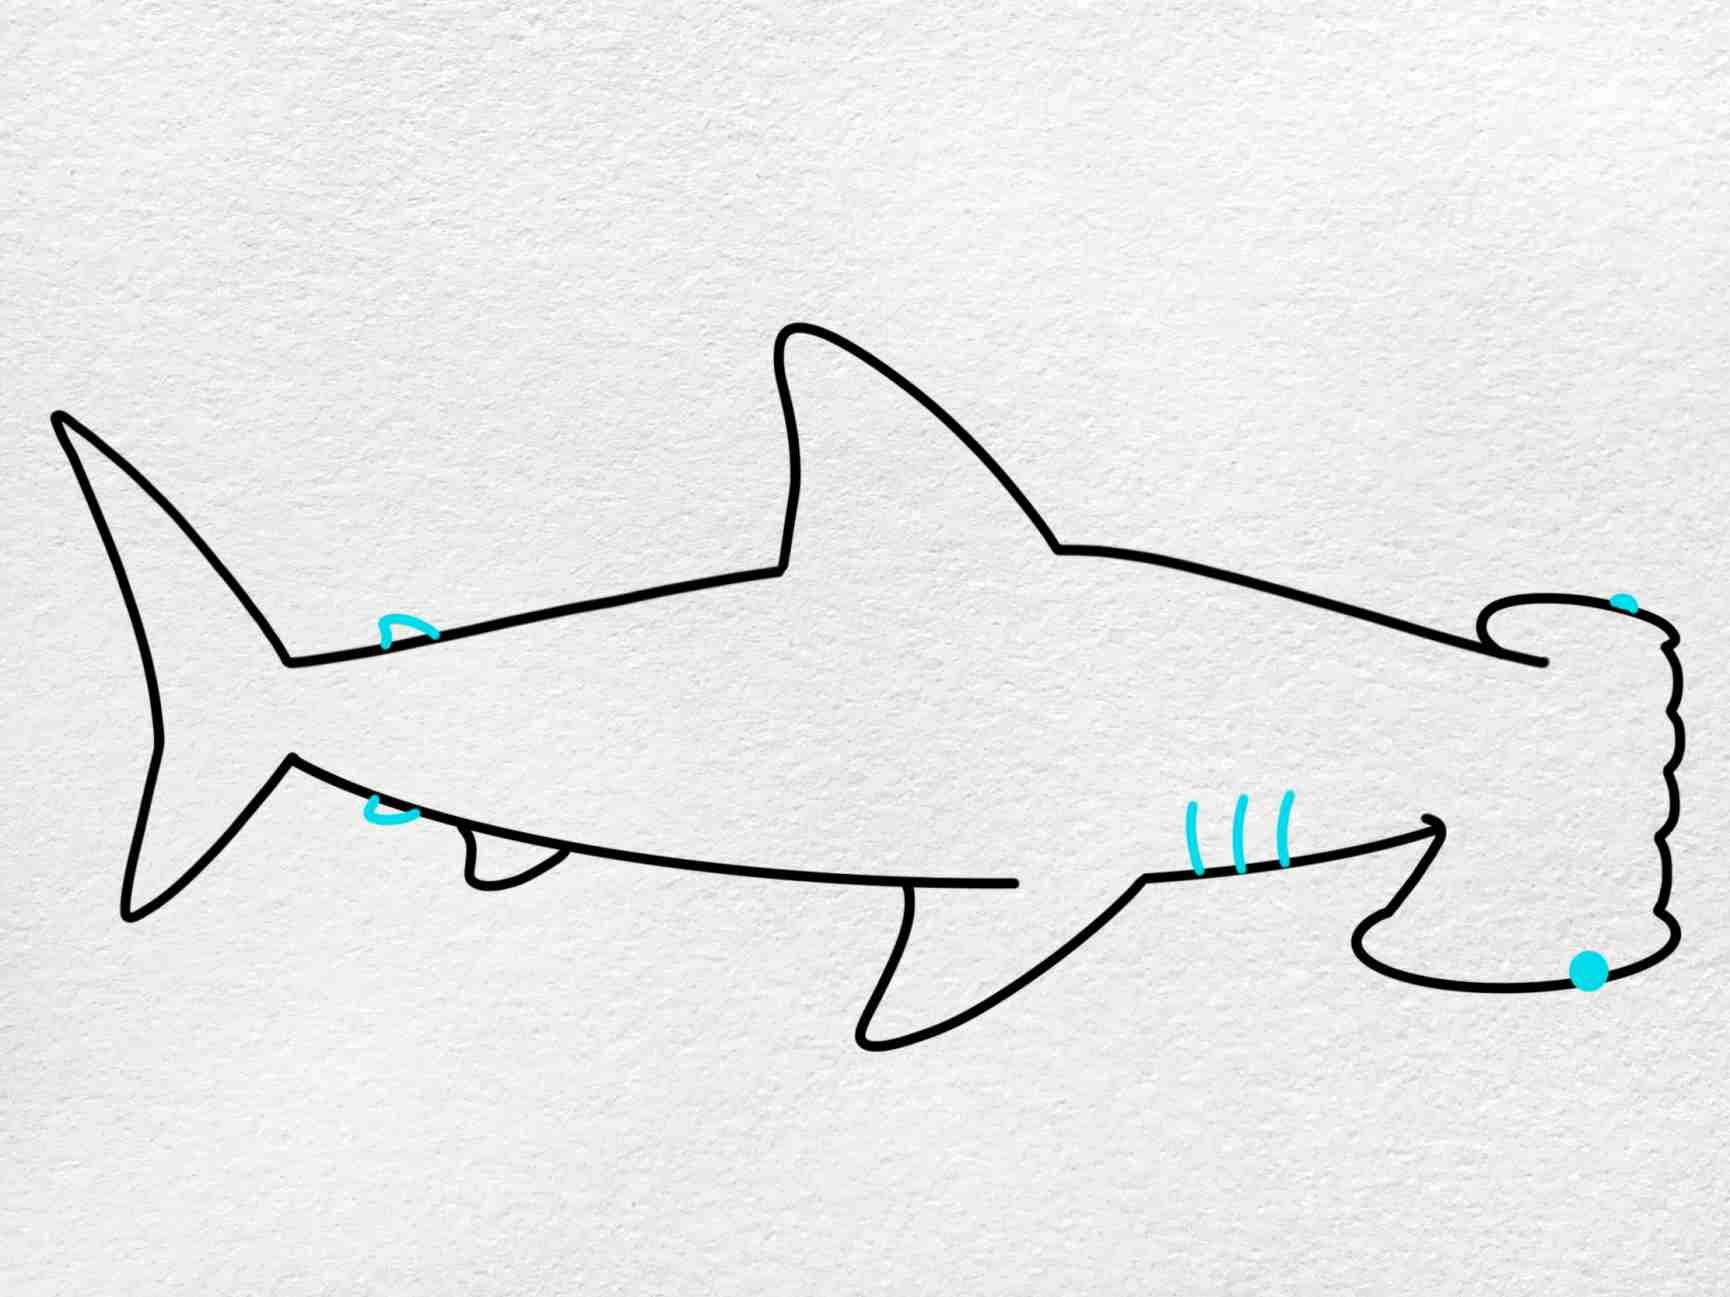 How To Draw A Hammerhead Shark: Step 5